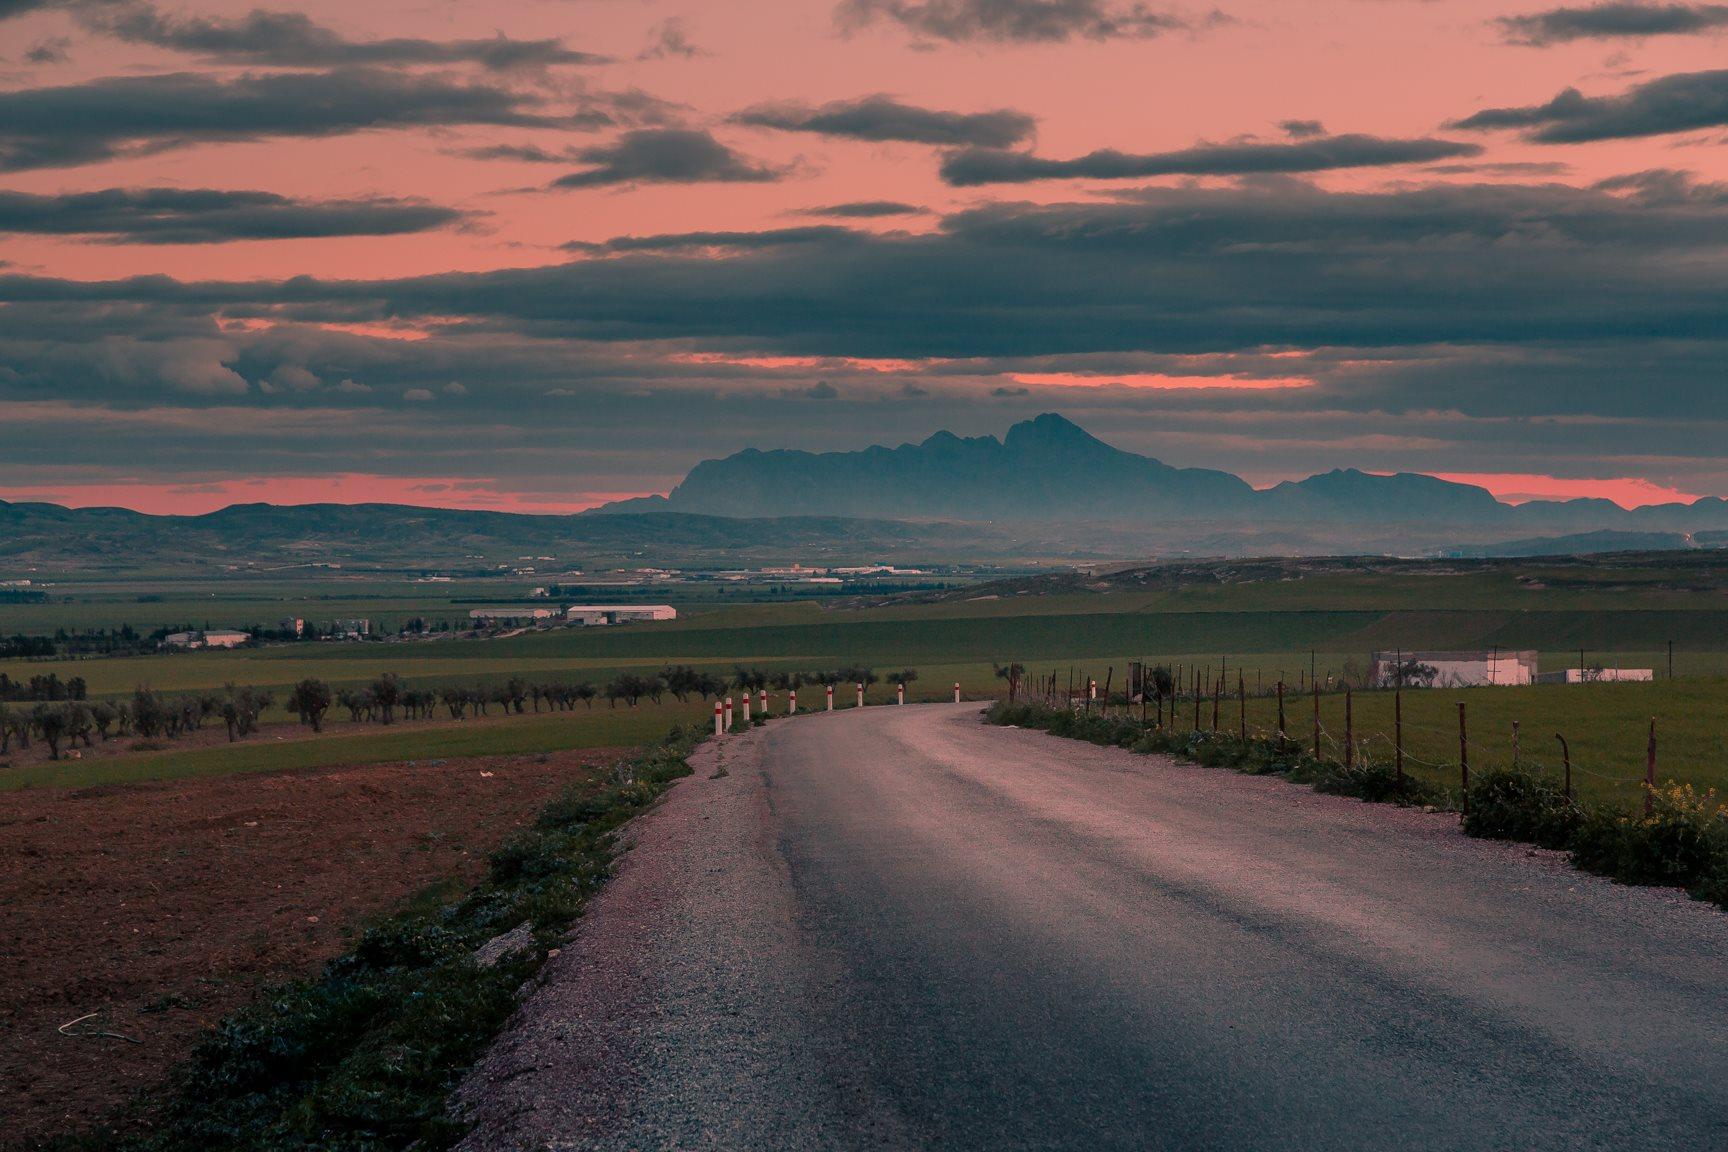 paysage-photographie-amine-mouelhi